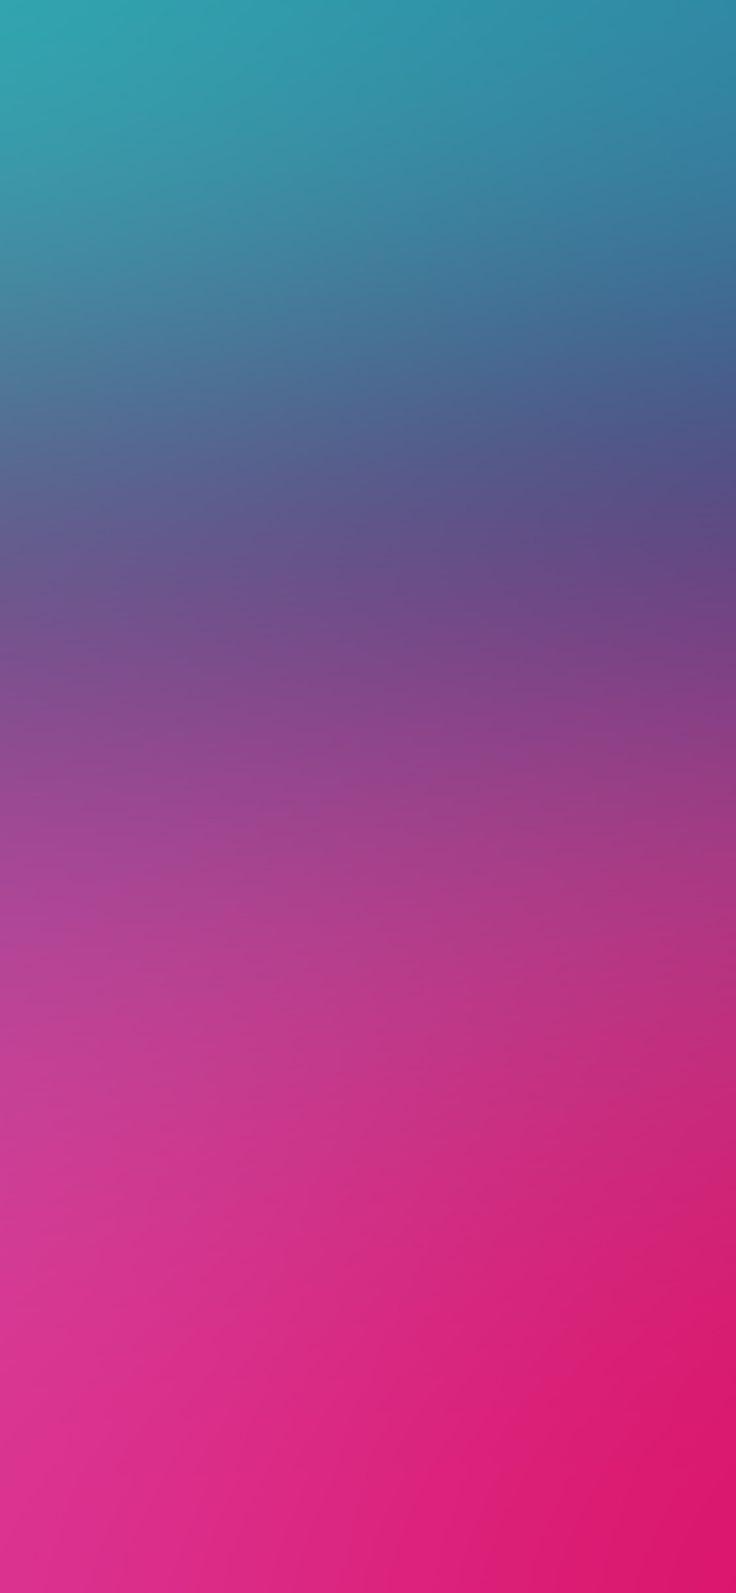 Iphone X Wallpaper Sn21 Red Blue Blur Gradation Via Iphonexpapers